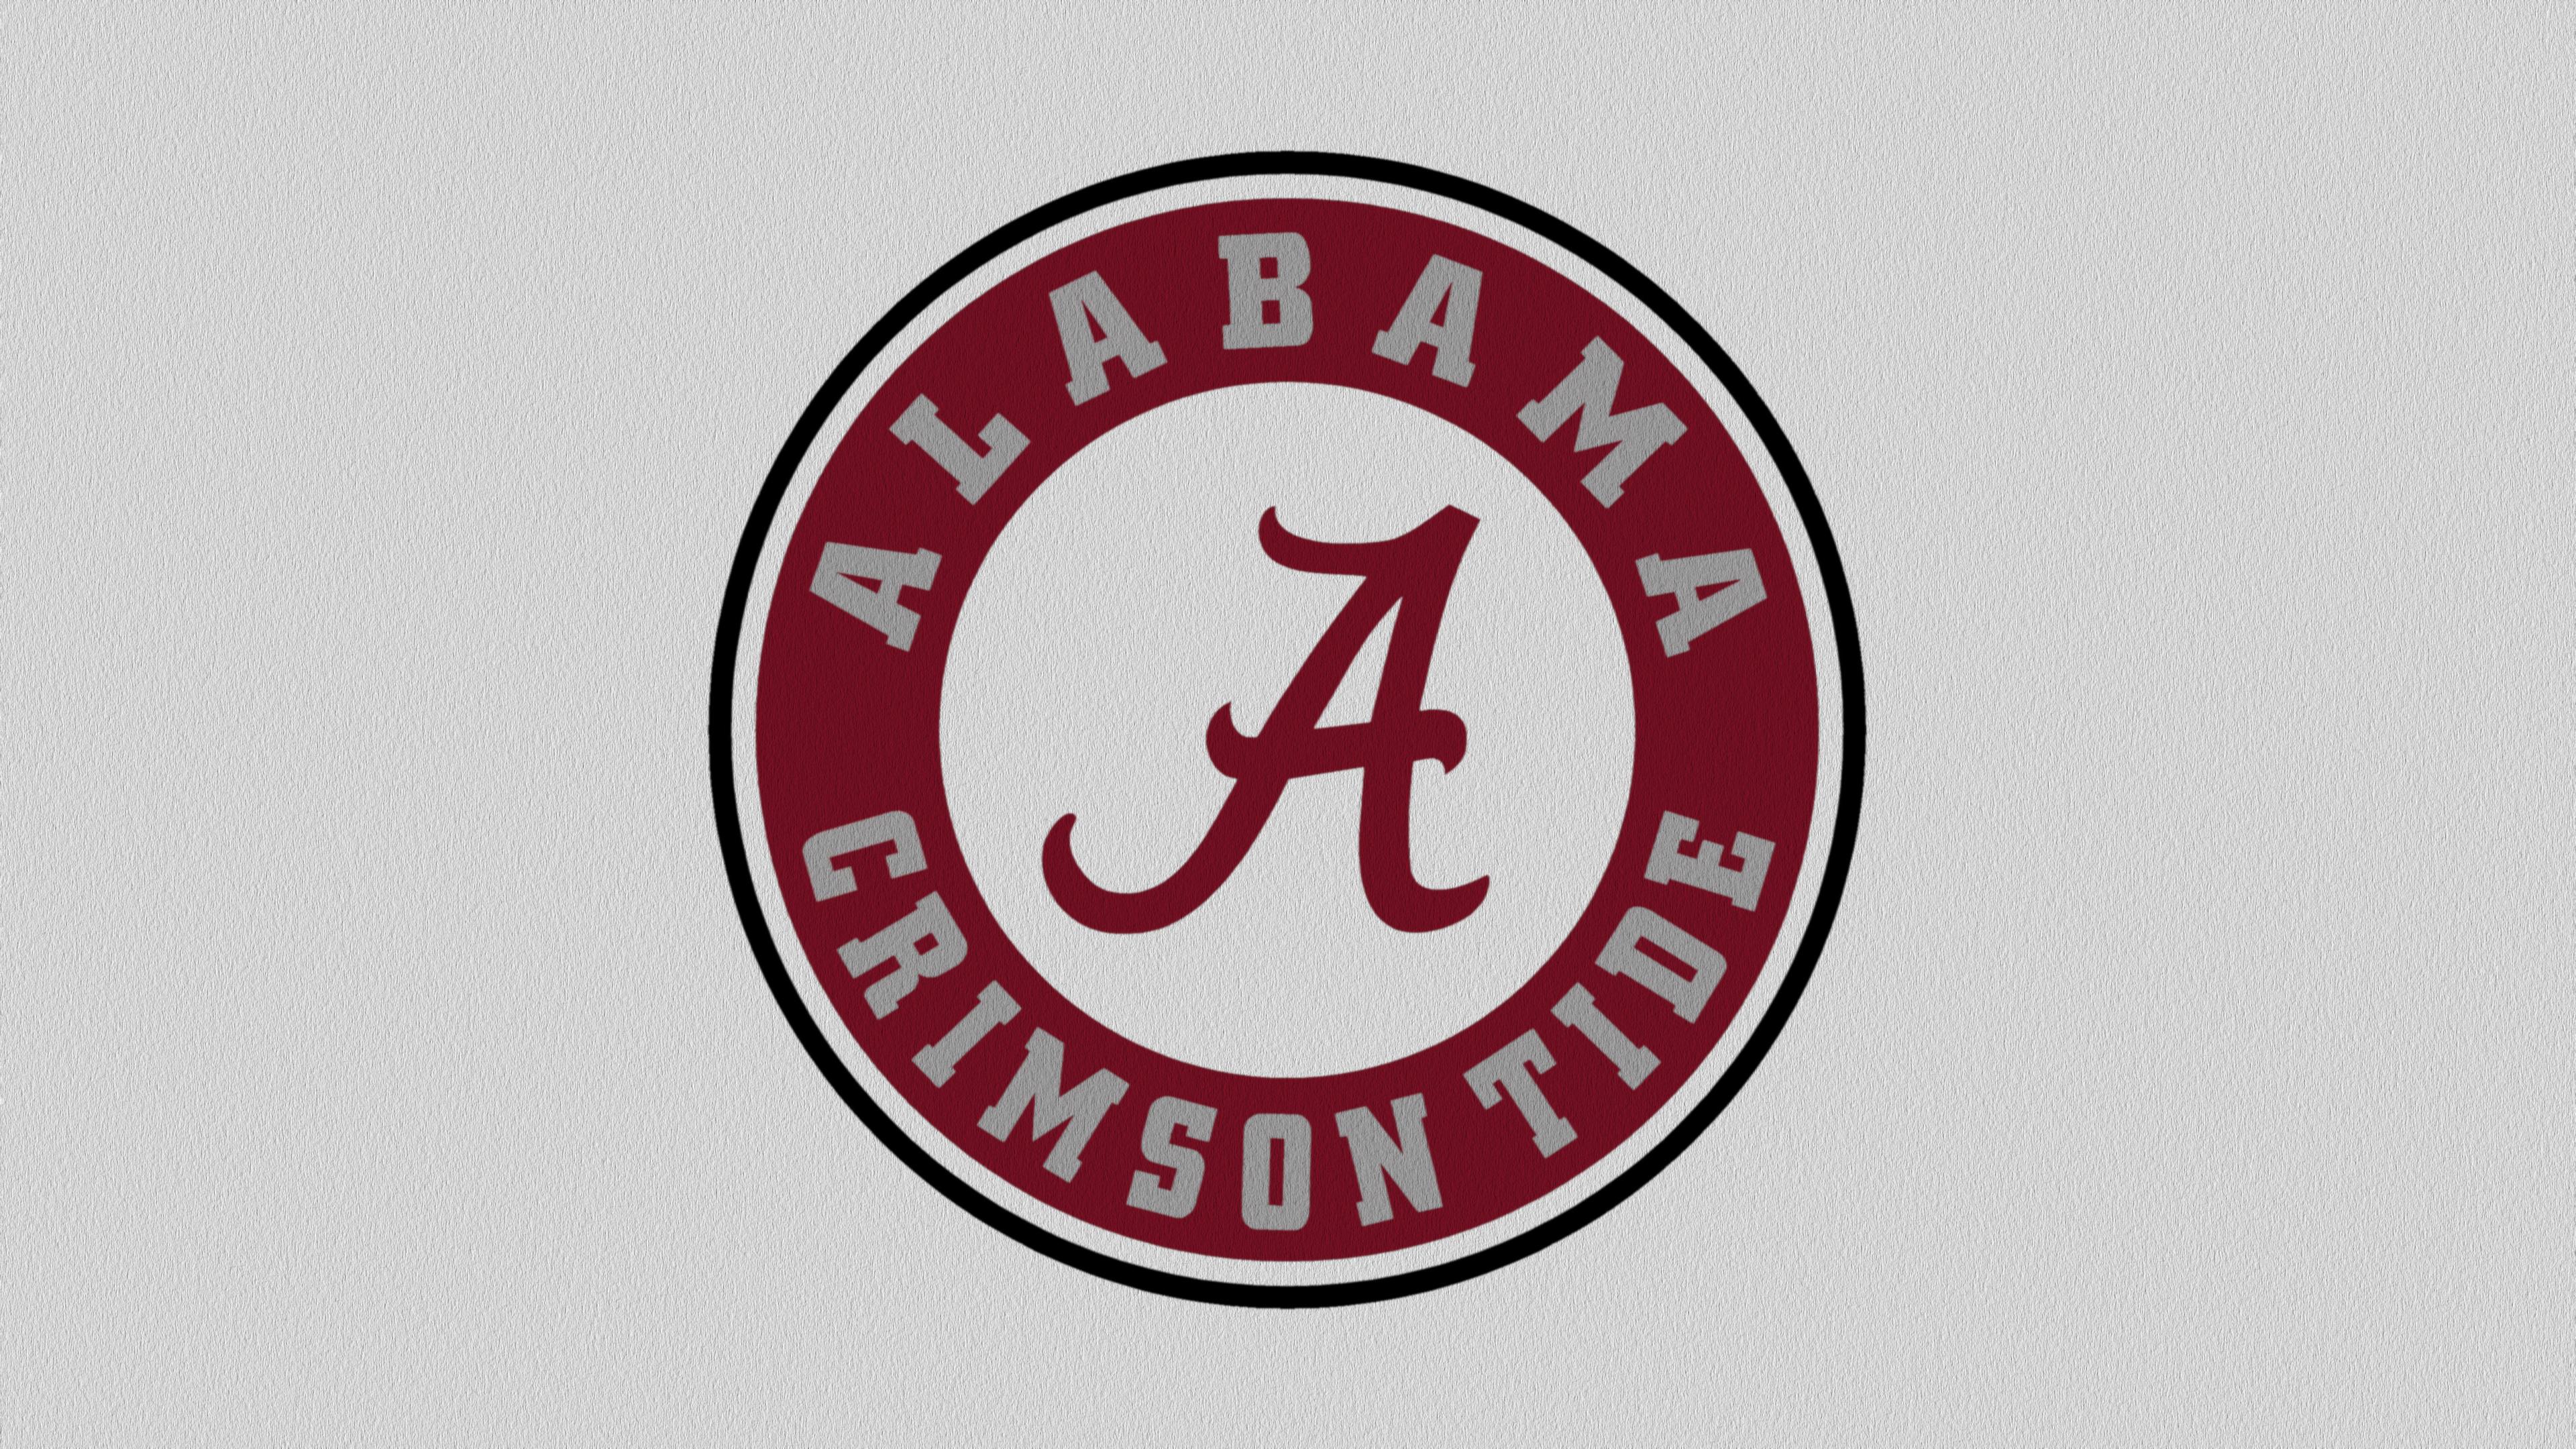 Texture White Alabama Football Retail Logos Desktop Wallpaper